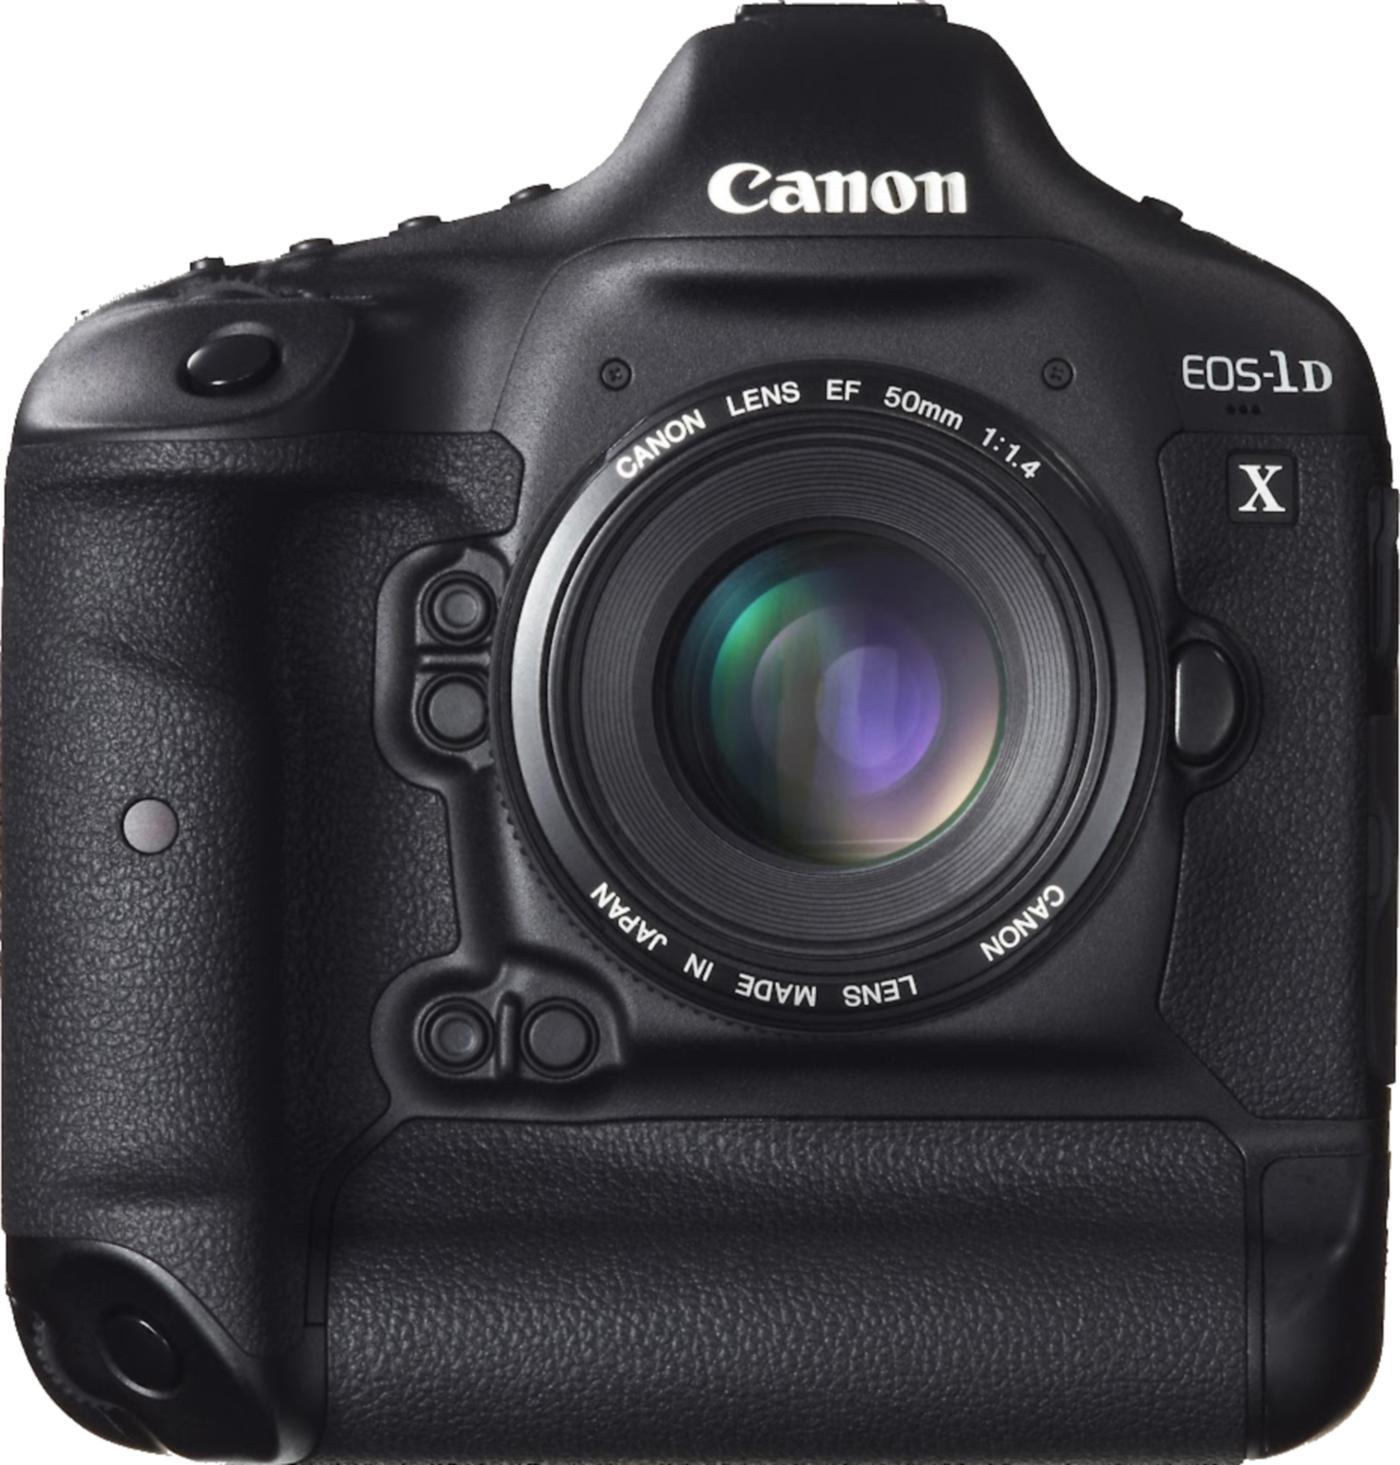 Canon EOS 1D X + Canon EF 50m f/1.4 USM